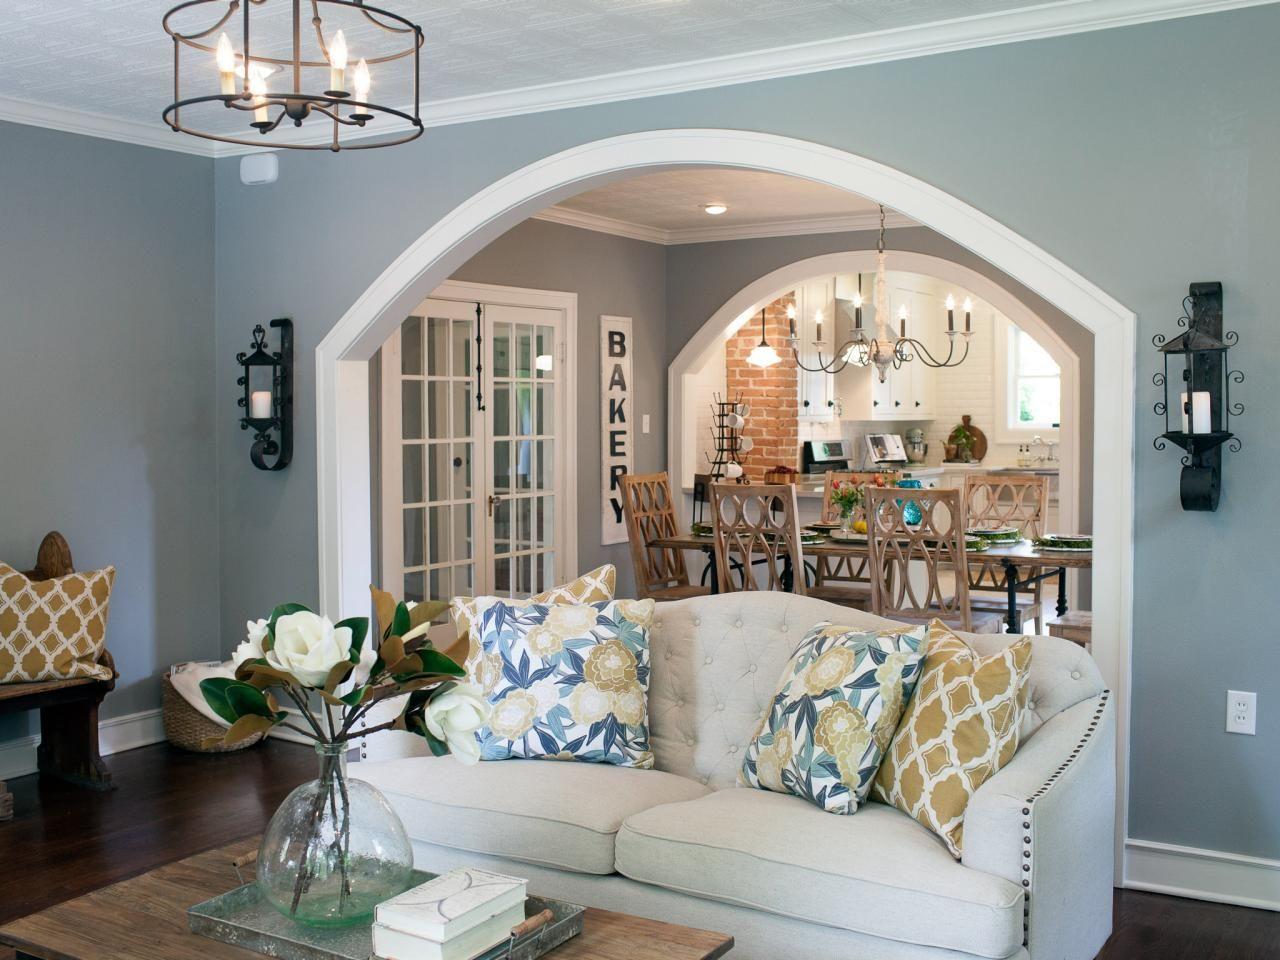 best 25+ family room colors ideas on pinterest | living room paint